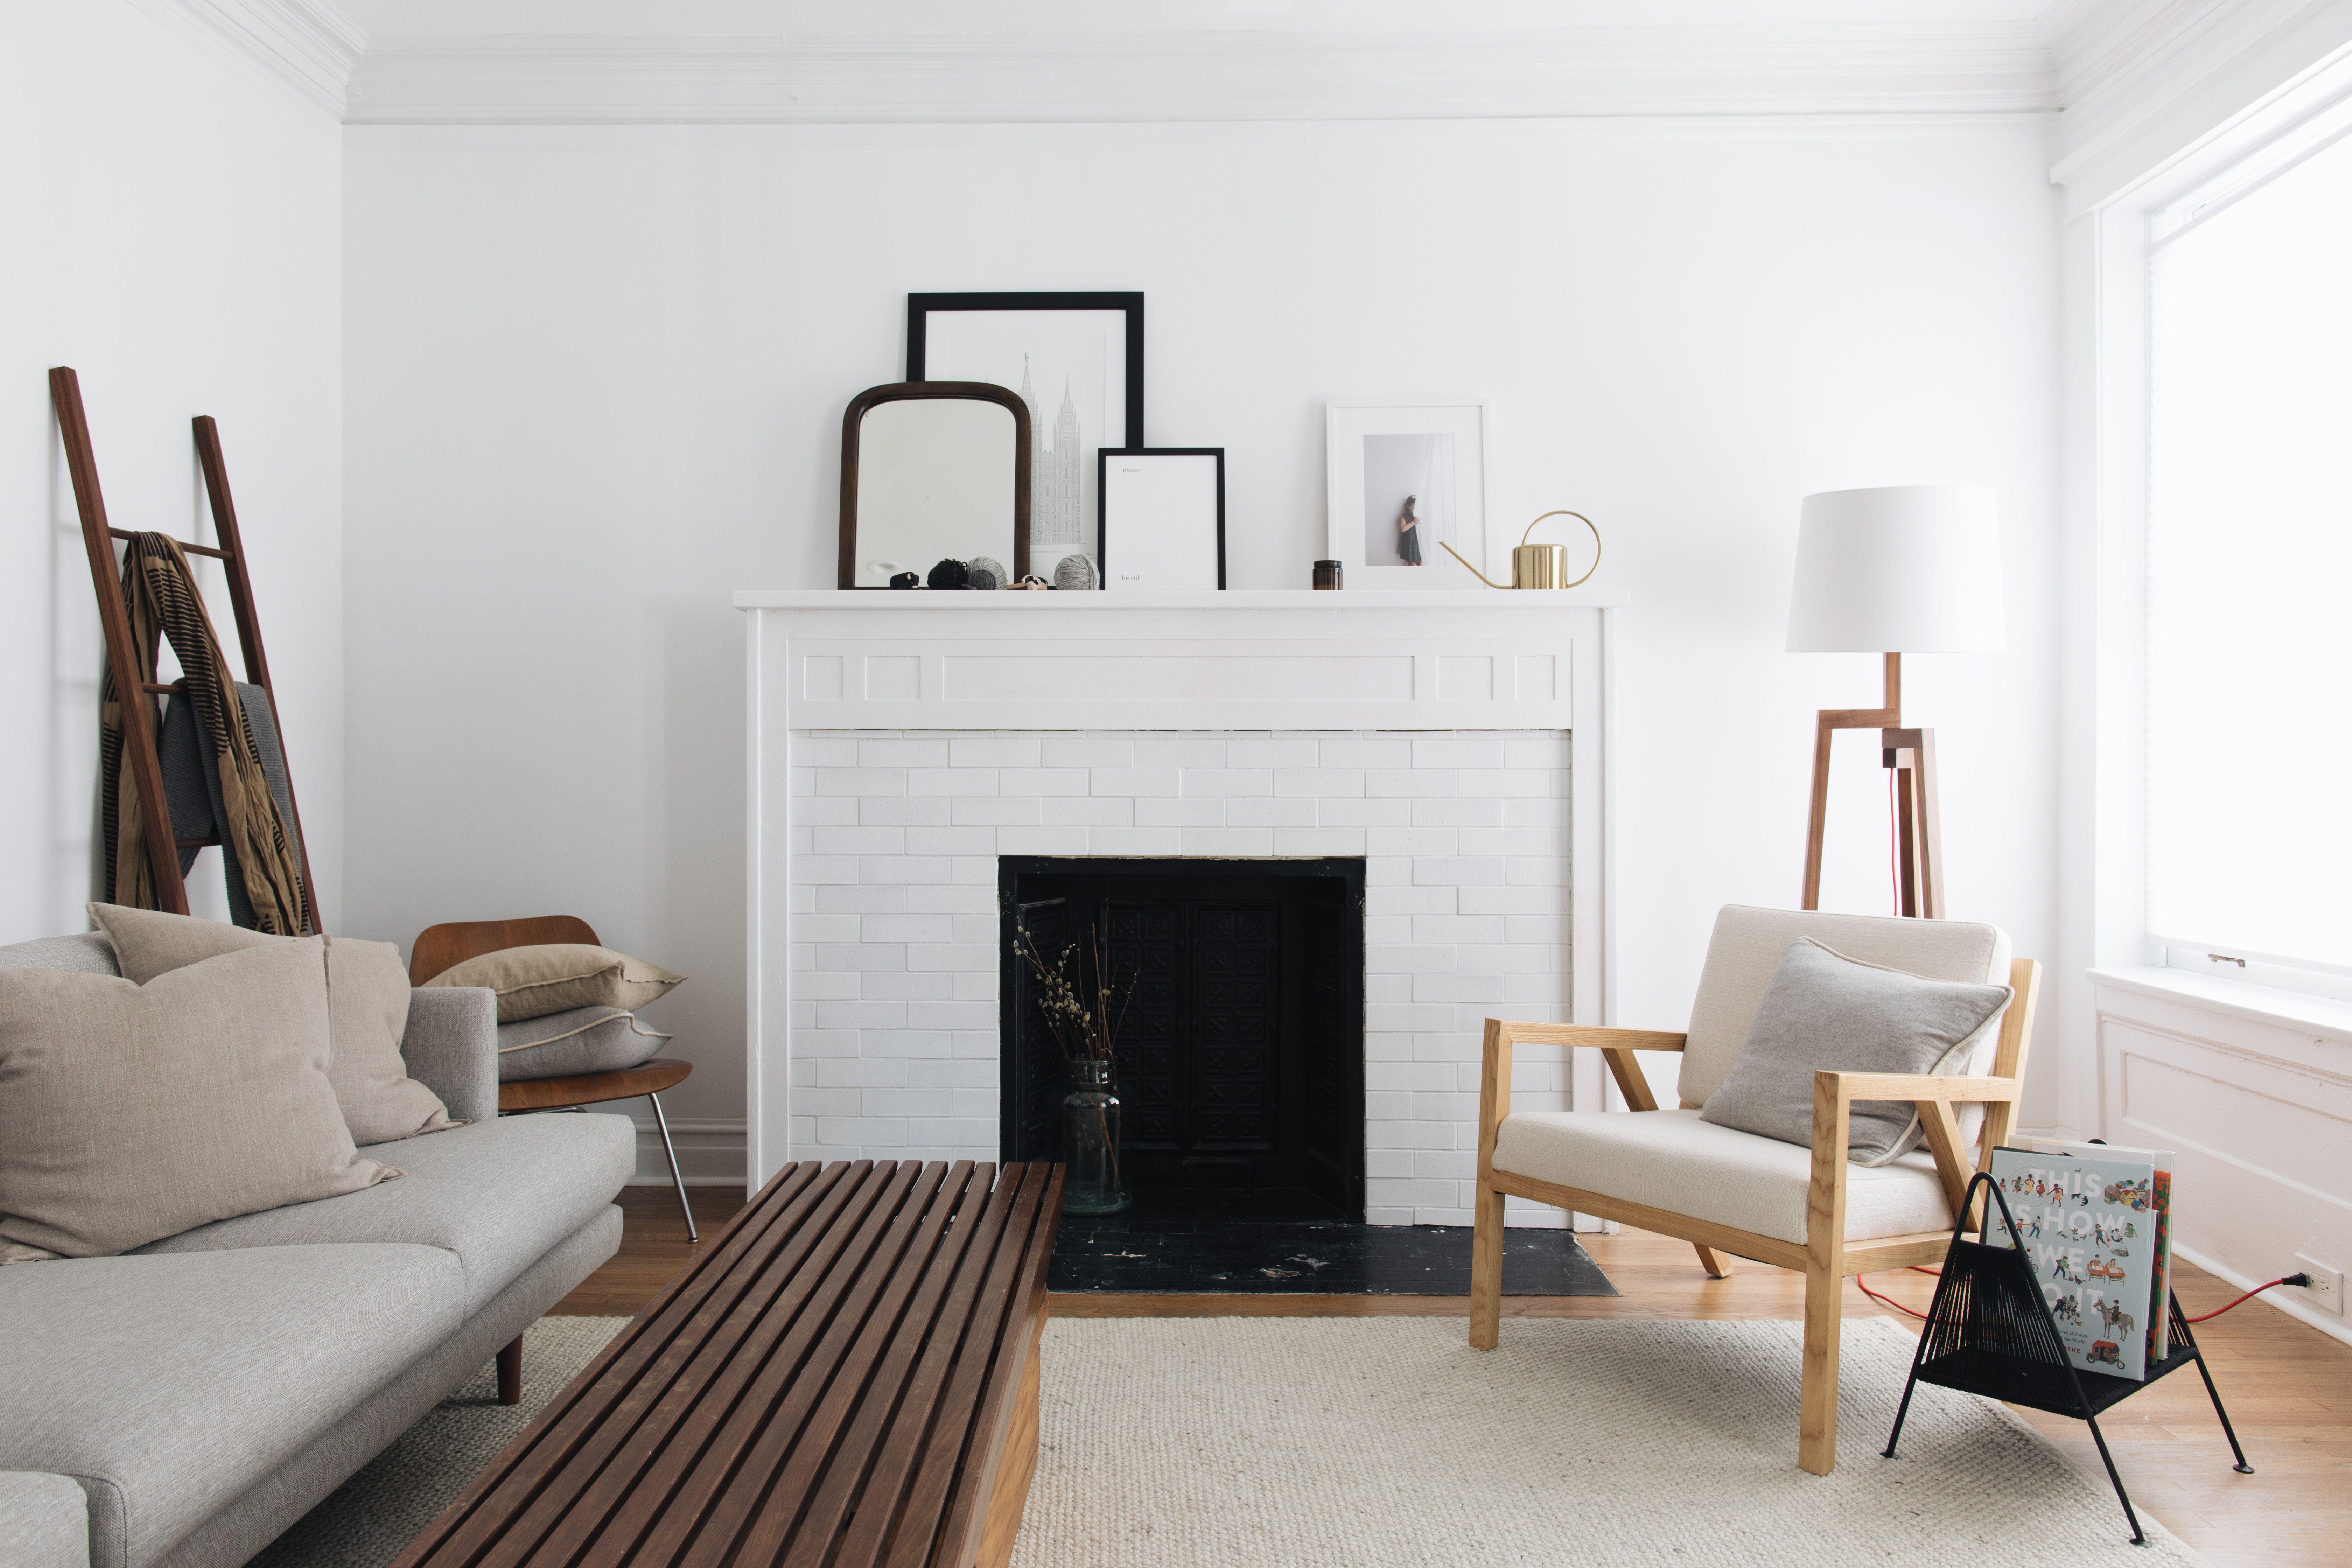 Fireplace Trends 2020.3 Hot Fireplace Tile Trends In 2019 Scandinavian Fireplace